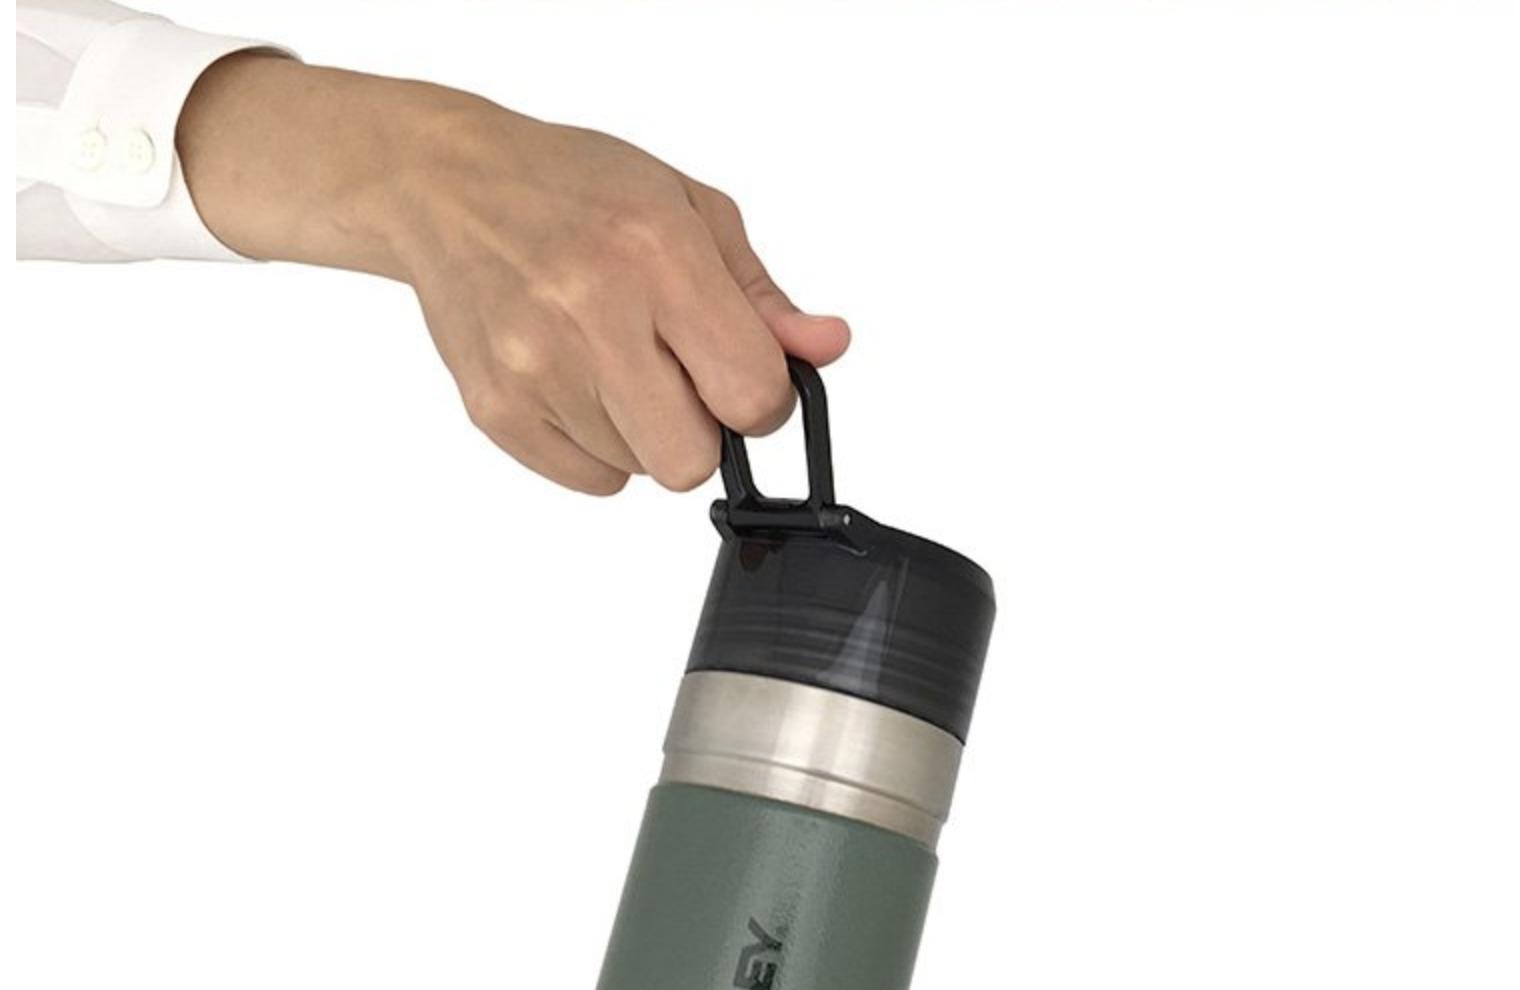 STANLEYスタンレー GO SERIESゴーシリーズ真空ボトル0.47Lブルー09541-009 スタンレー水筒のエントリーモデルにおすすめ